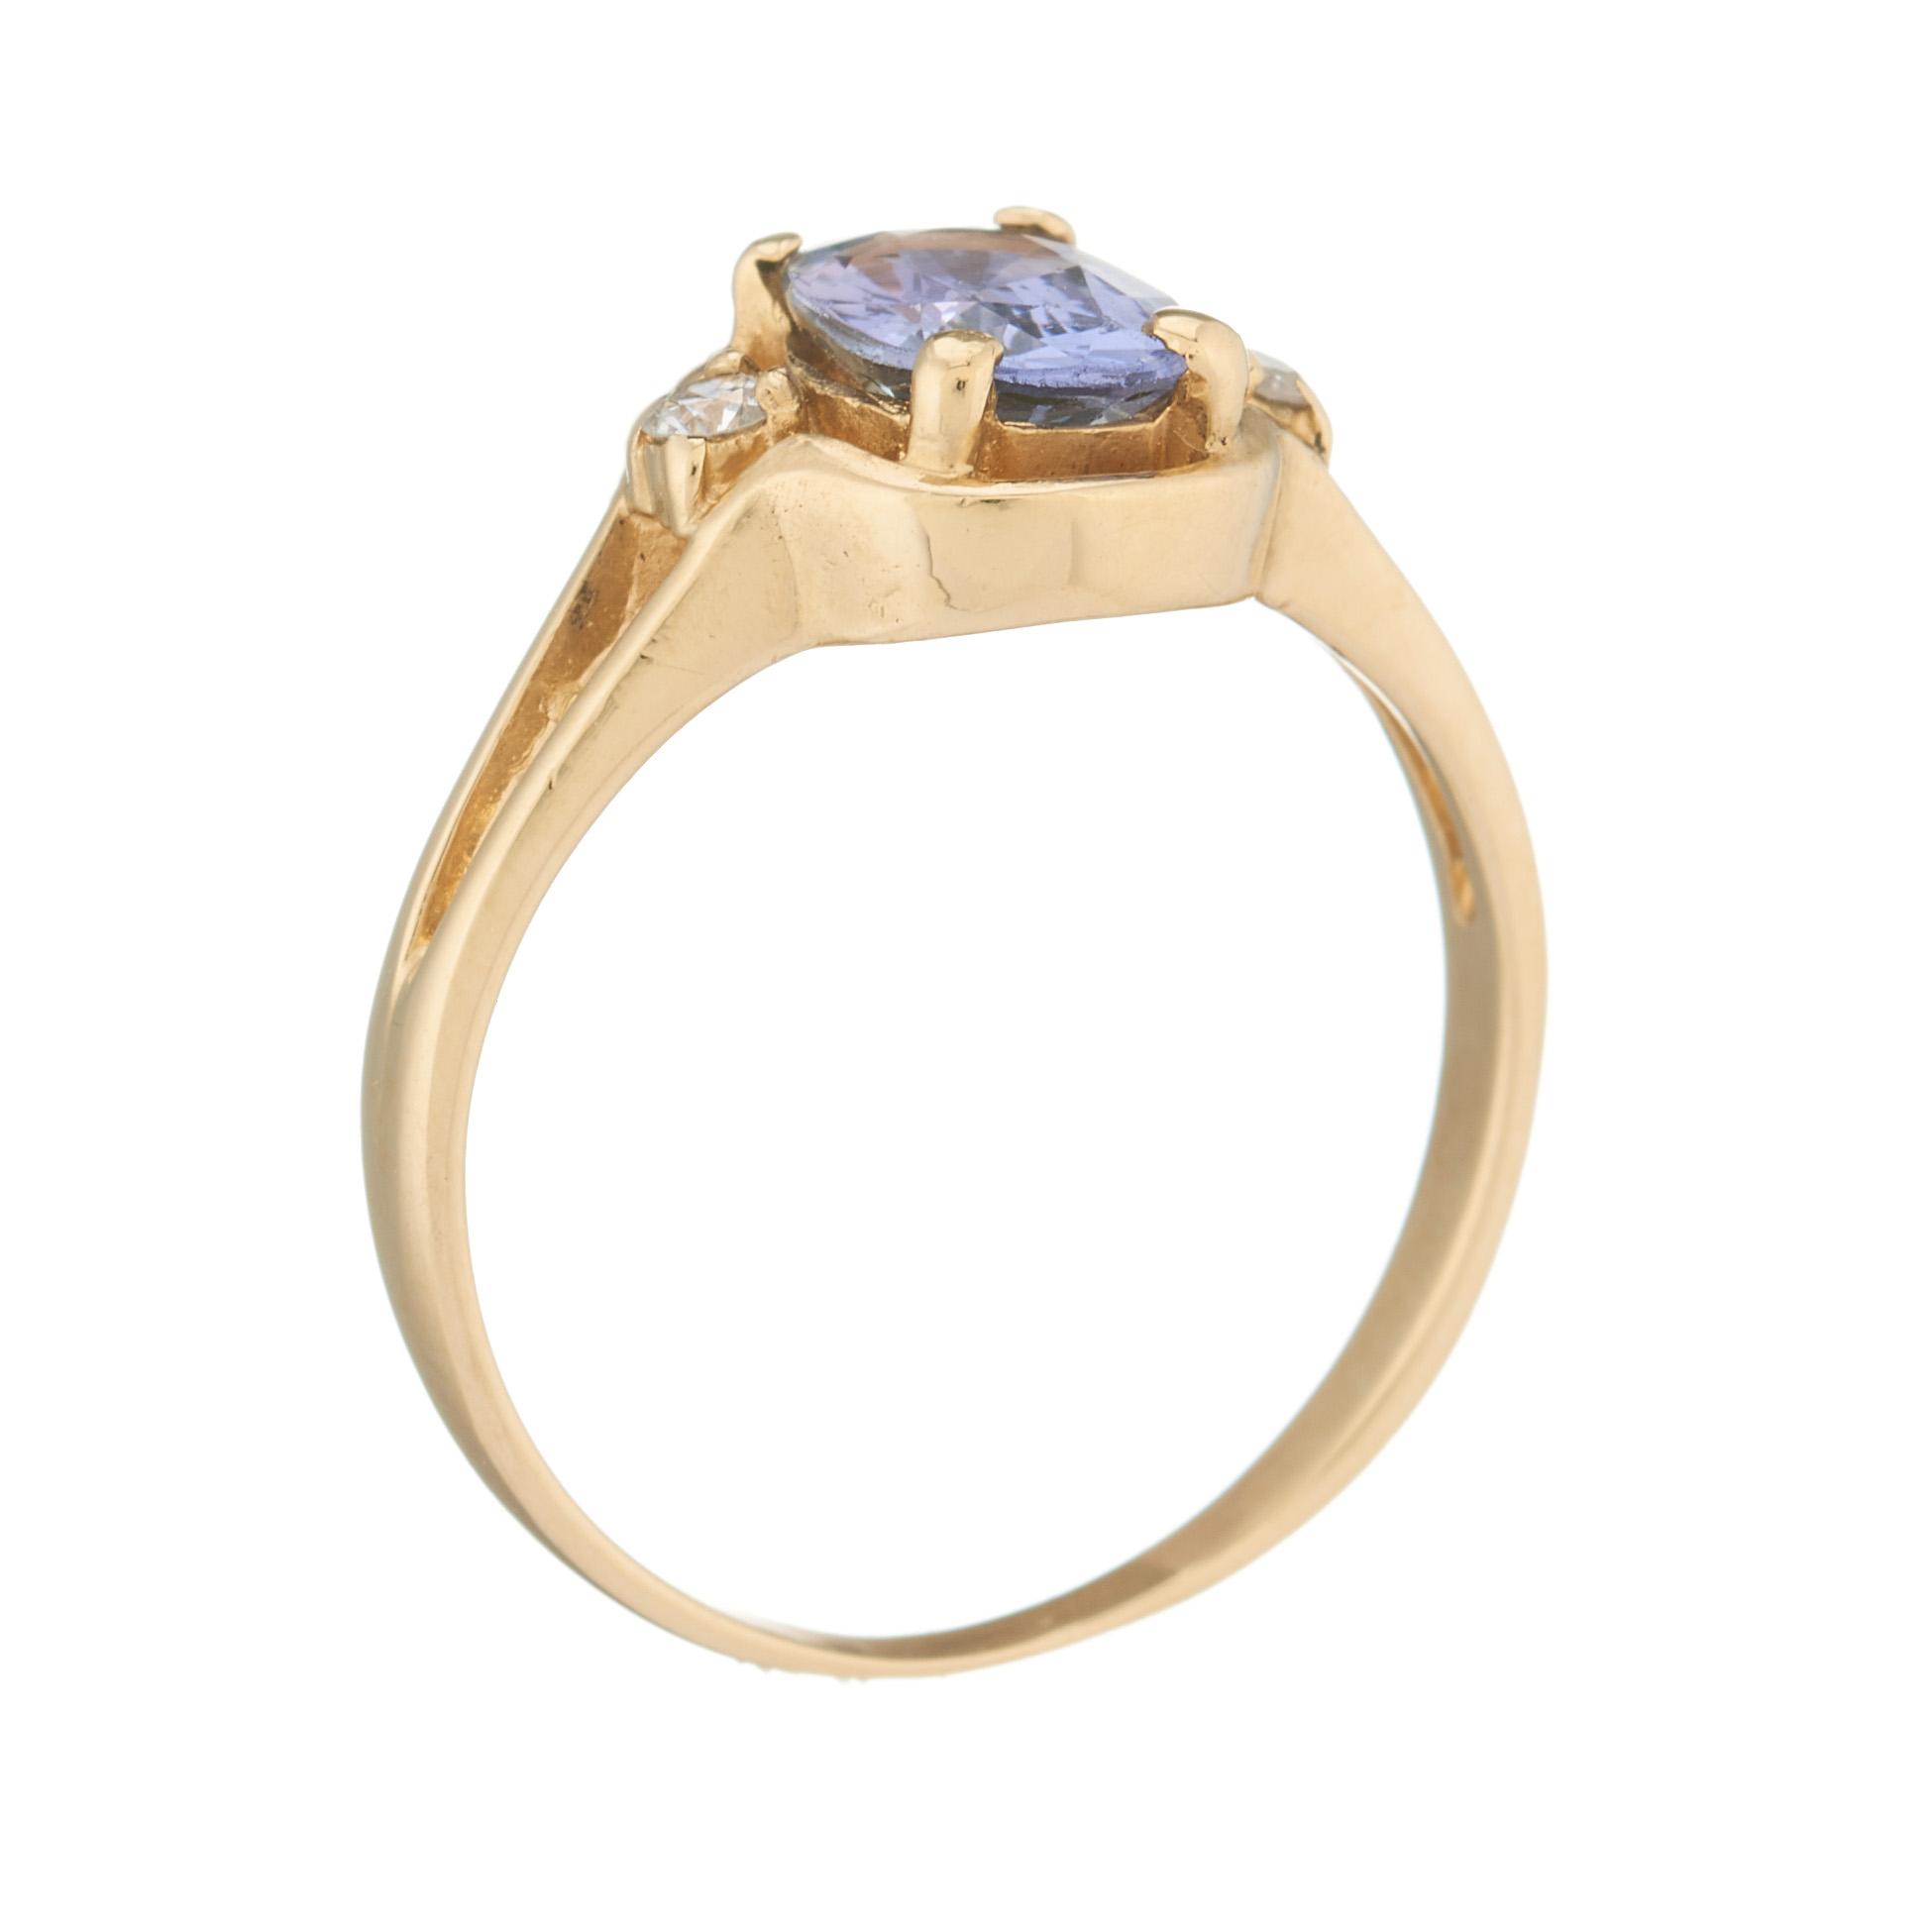 A 14ct gold tanzanite and diamond three-stone ring - Image 2 of 2